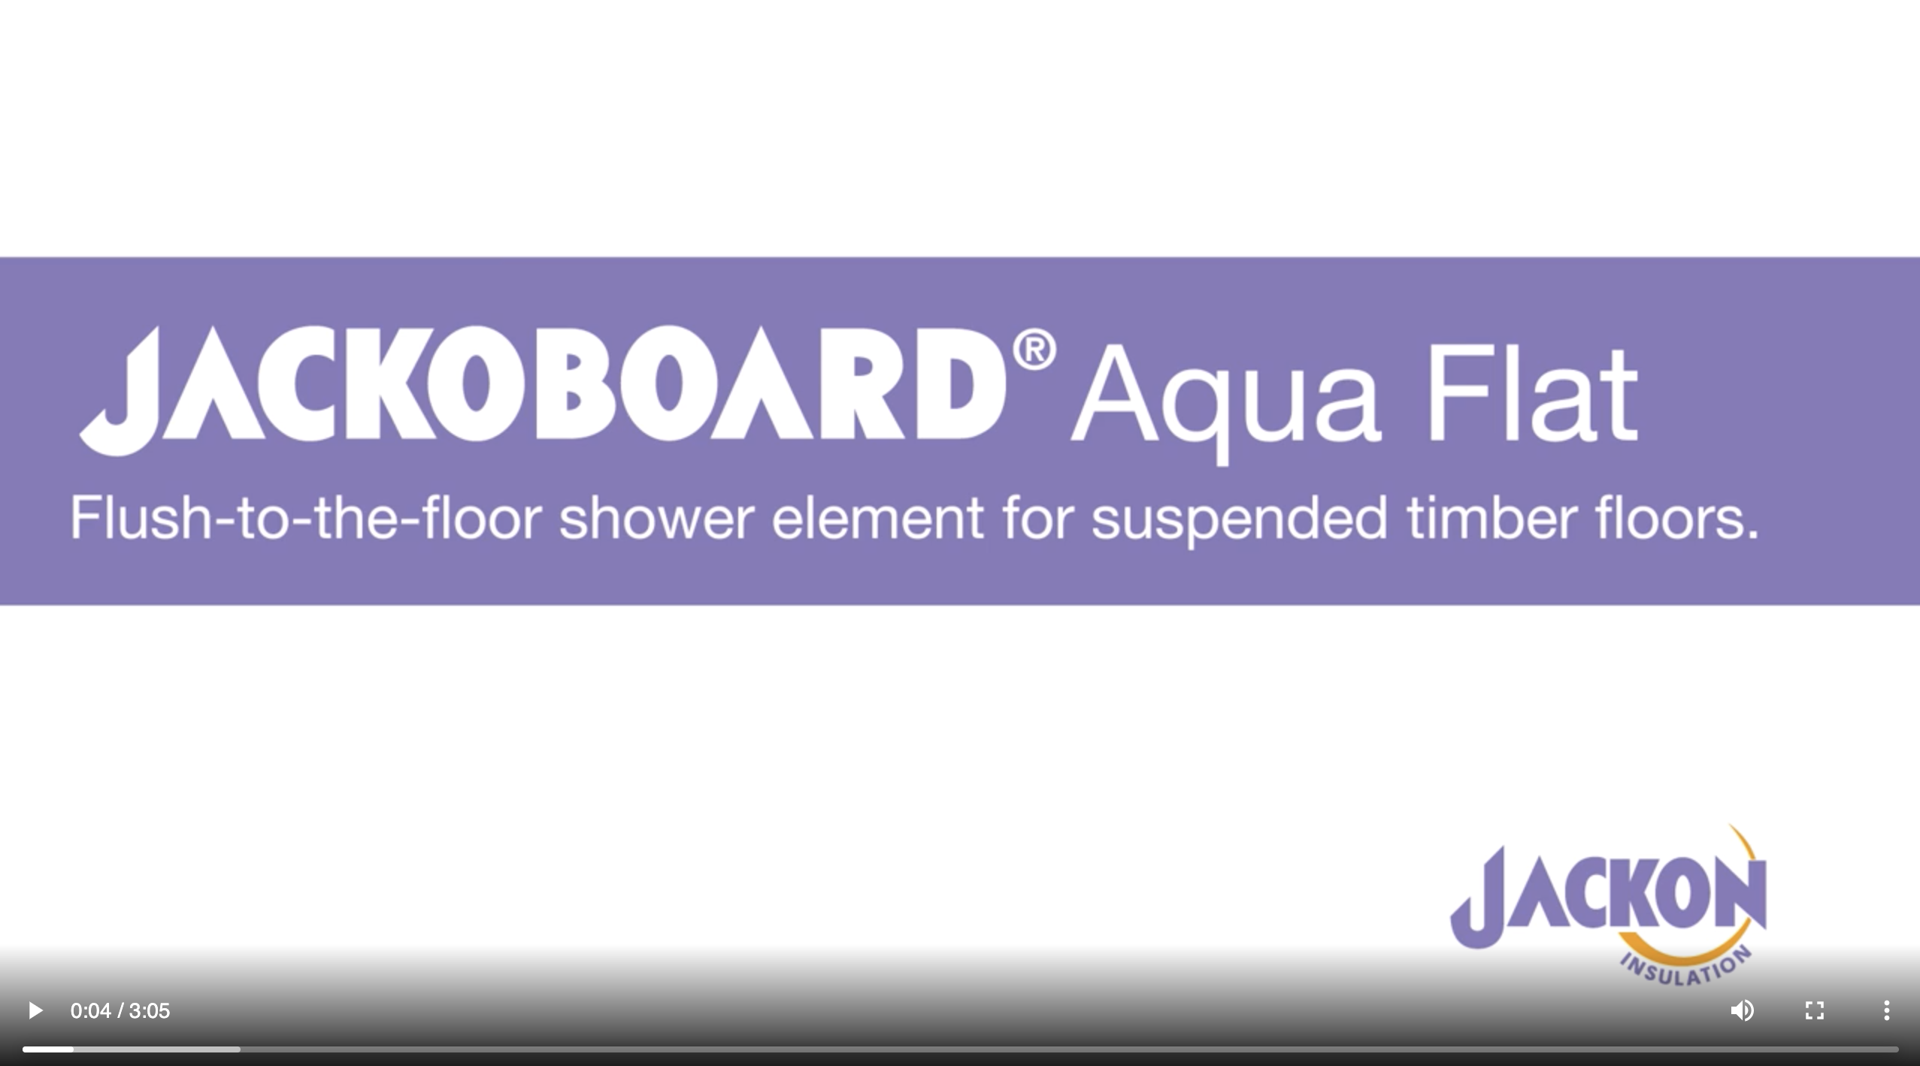 JACKOBOARD Aqua Flat and JACKOBOARD Plano